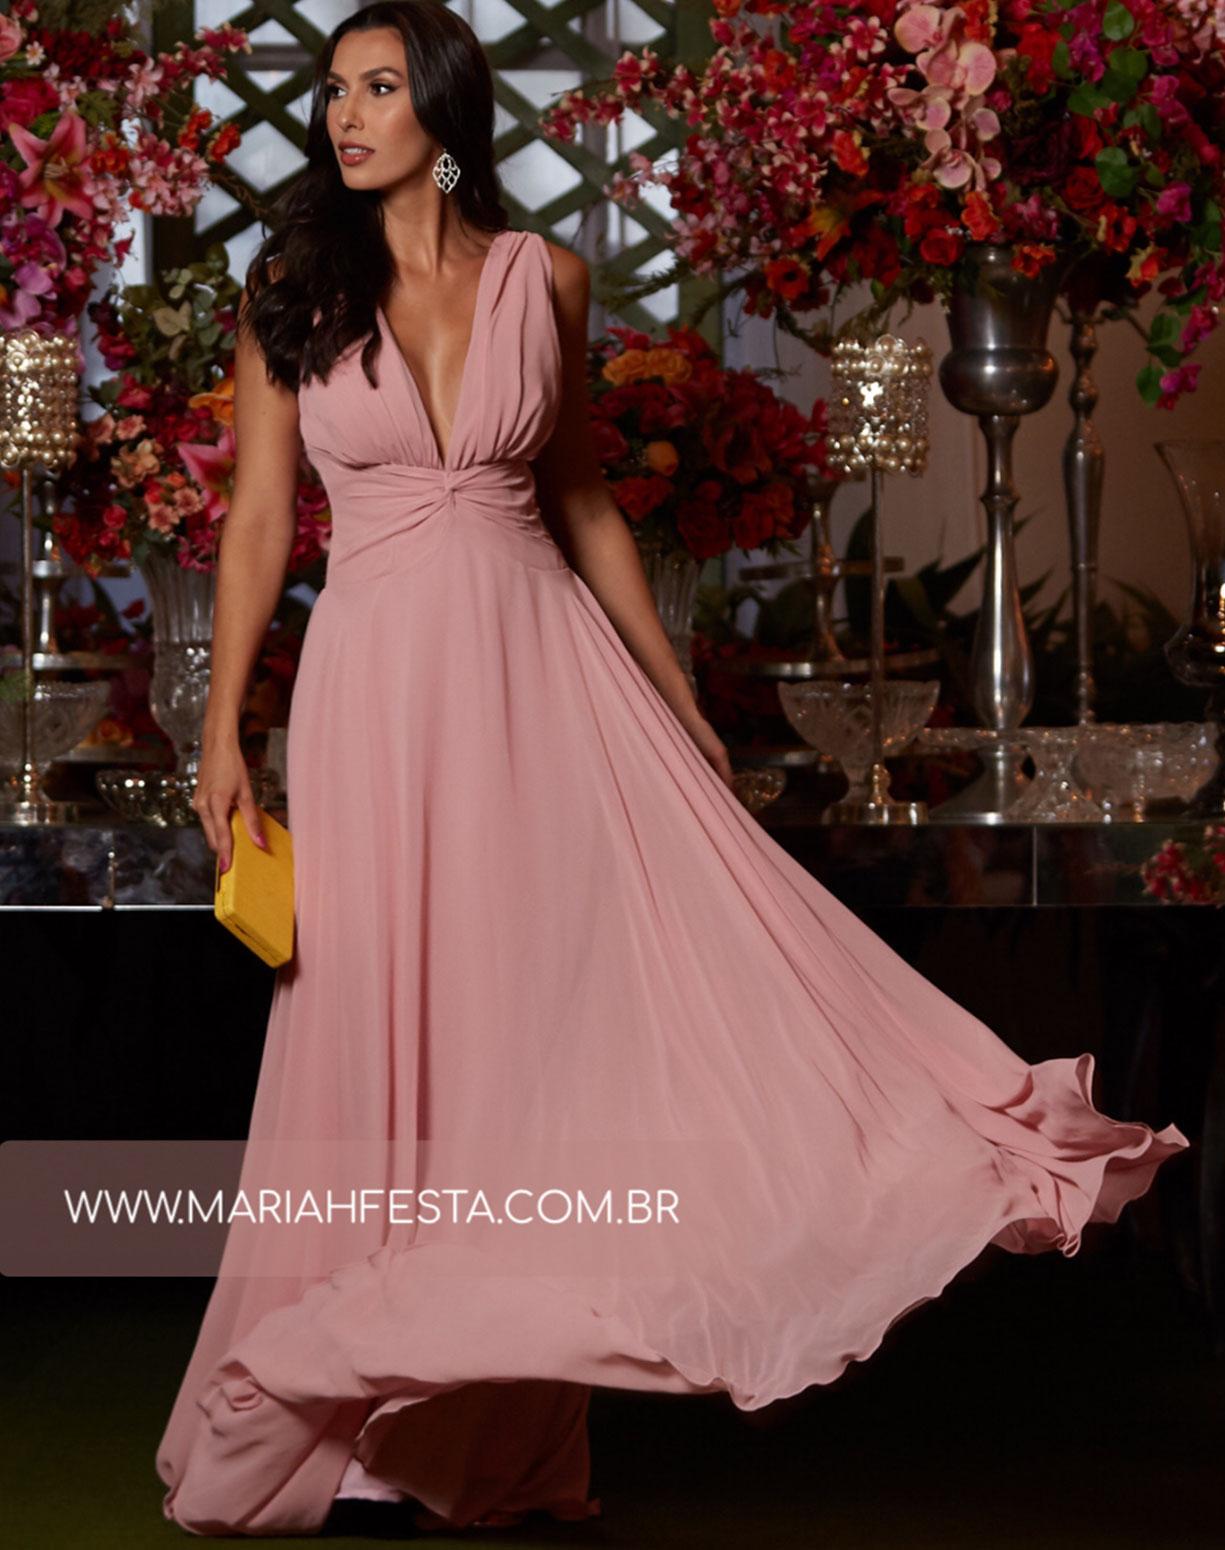 Vestido Rose com Busto Drapeado e Saia Evasê